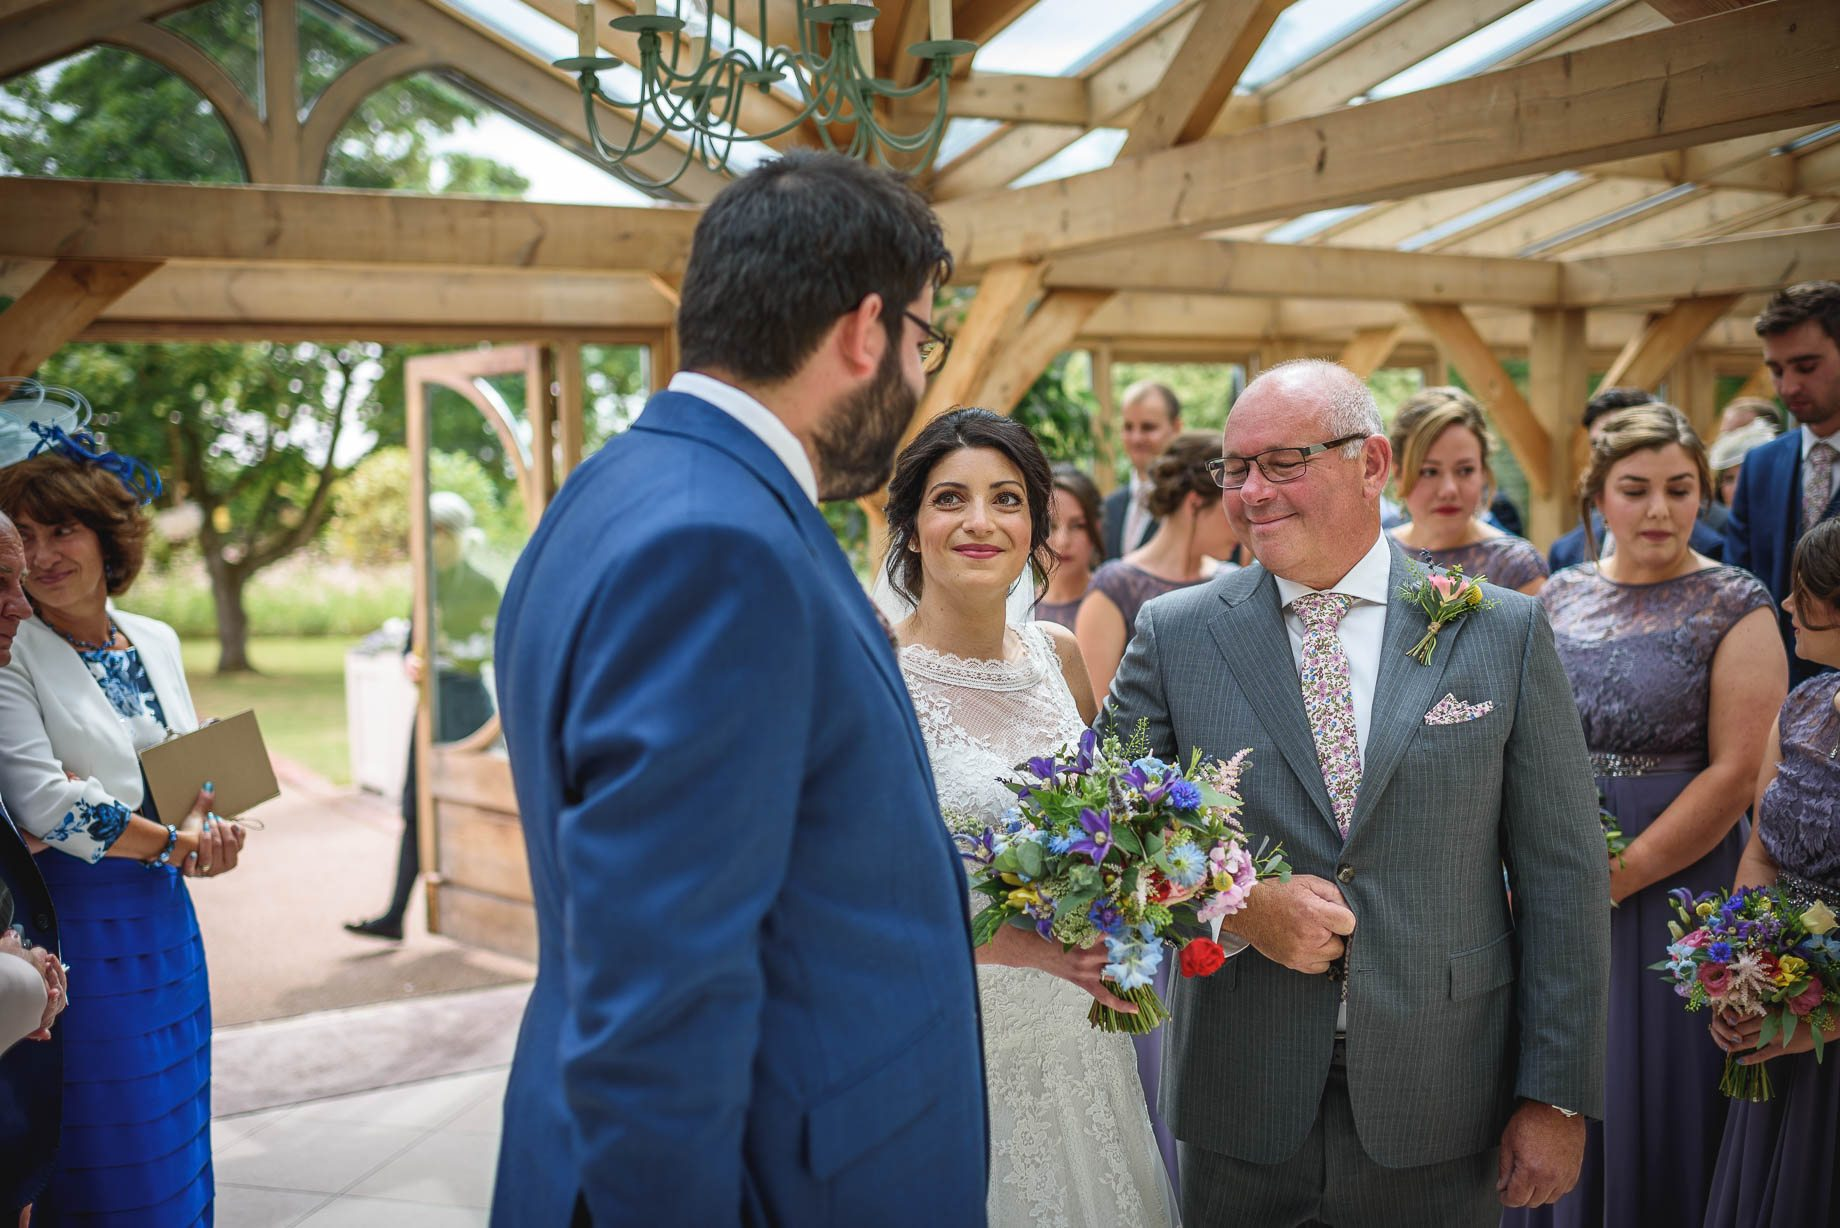 Gaynes Park wedding photography - Guy Collier Photography - Rachel and Jon (66 of 169)